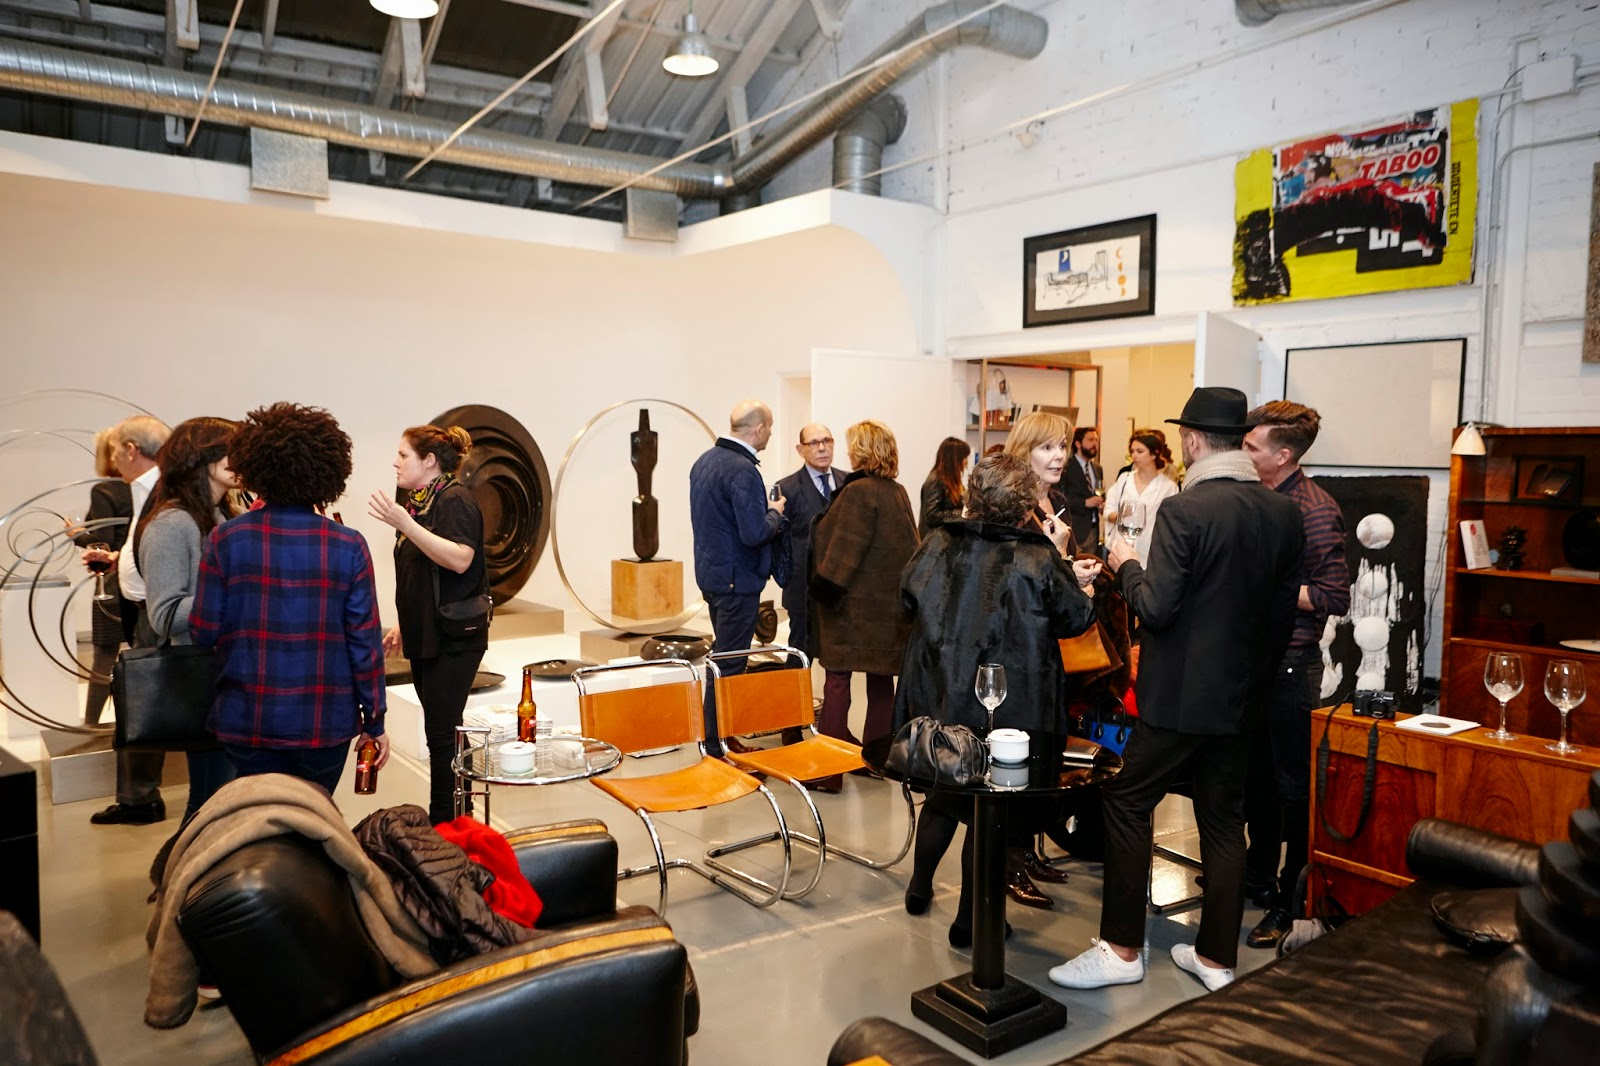 Adolfo Barnatán, Arte, Escultura, Pintura, ARCO 2015, Elena Benarroch, Juan Gatti, Felipe Gonzalez, Emma Suarez, Antonia San Juan, Party Time